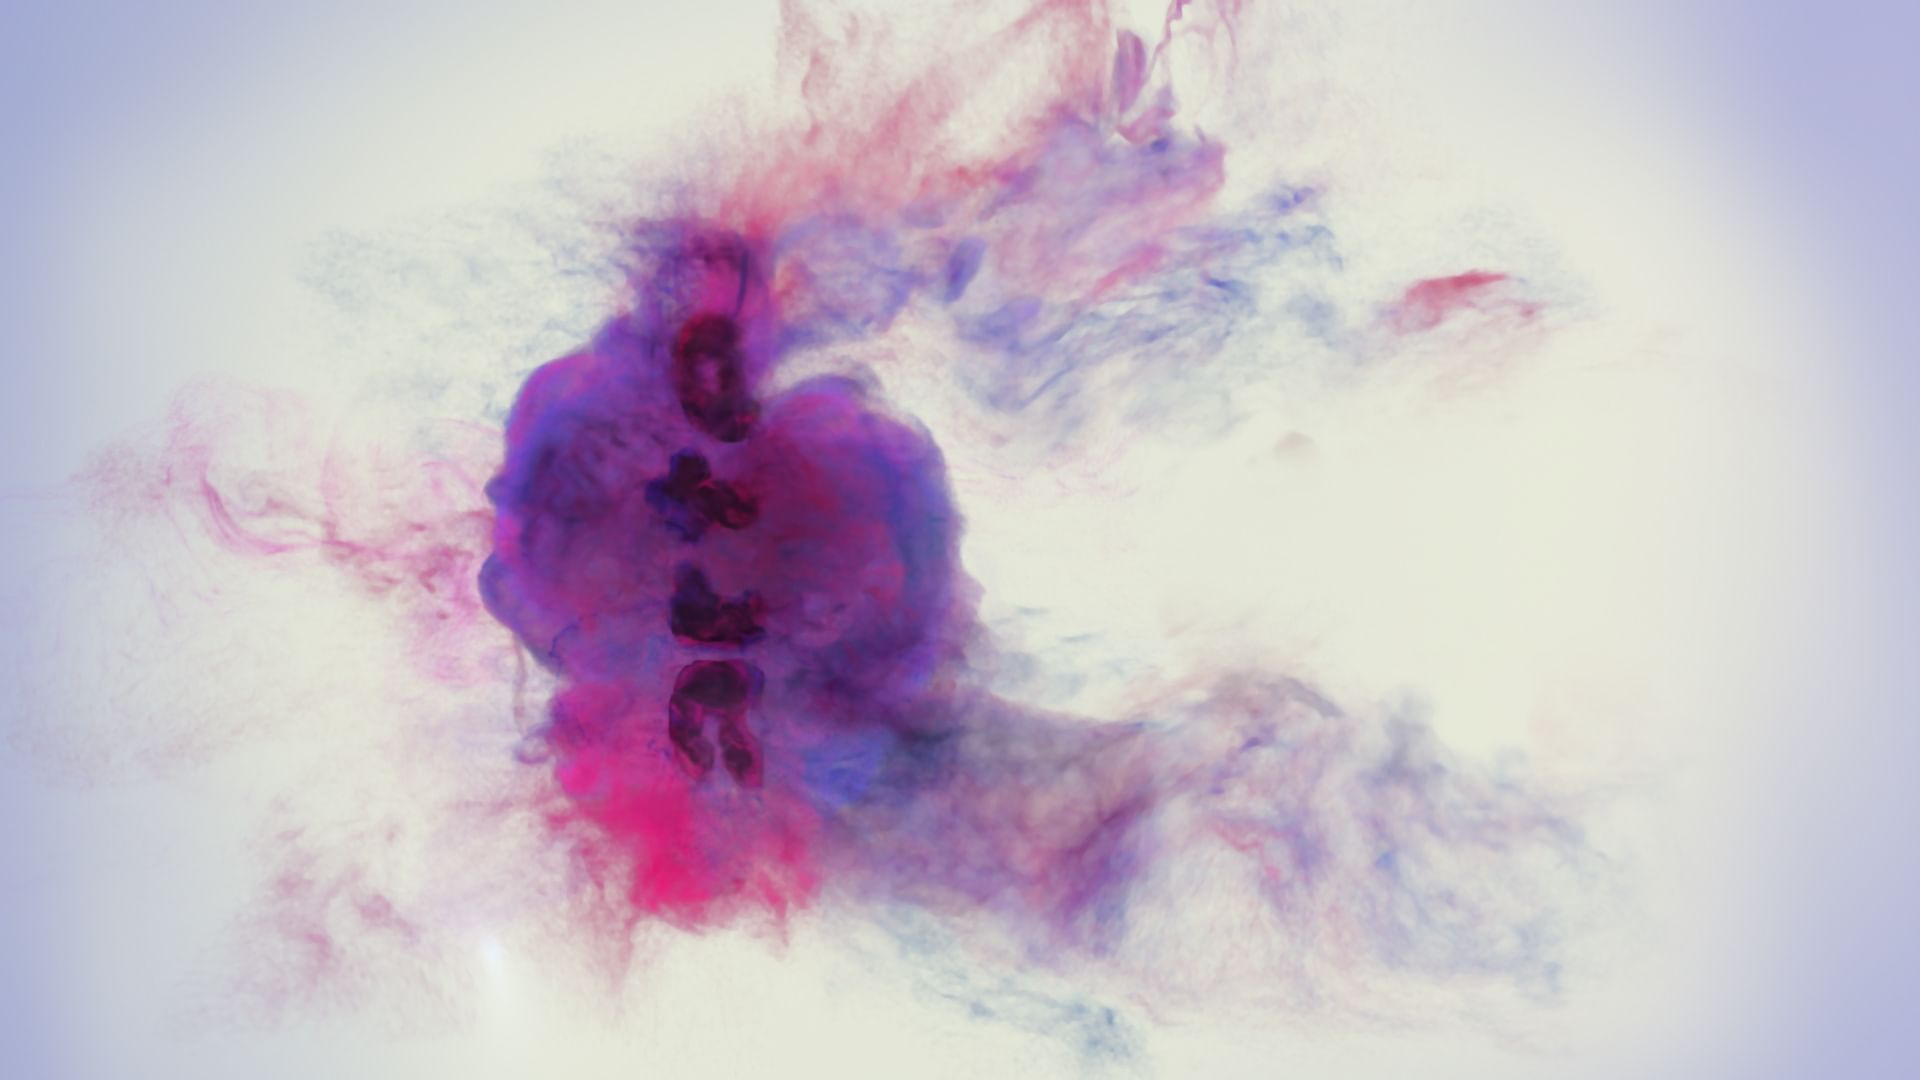 Titanic, l'ultime scénario